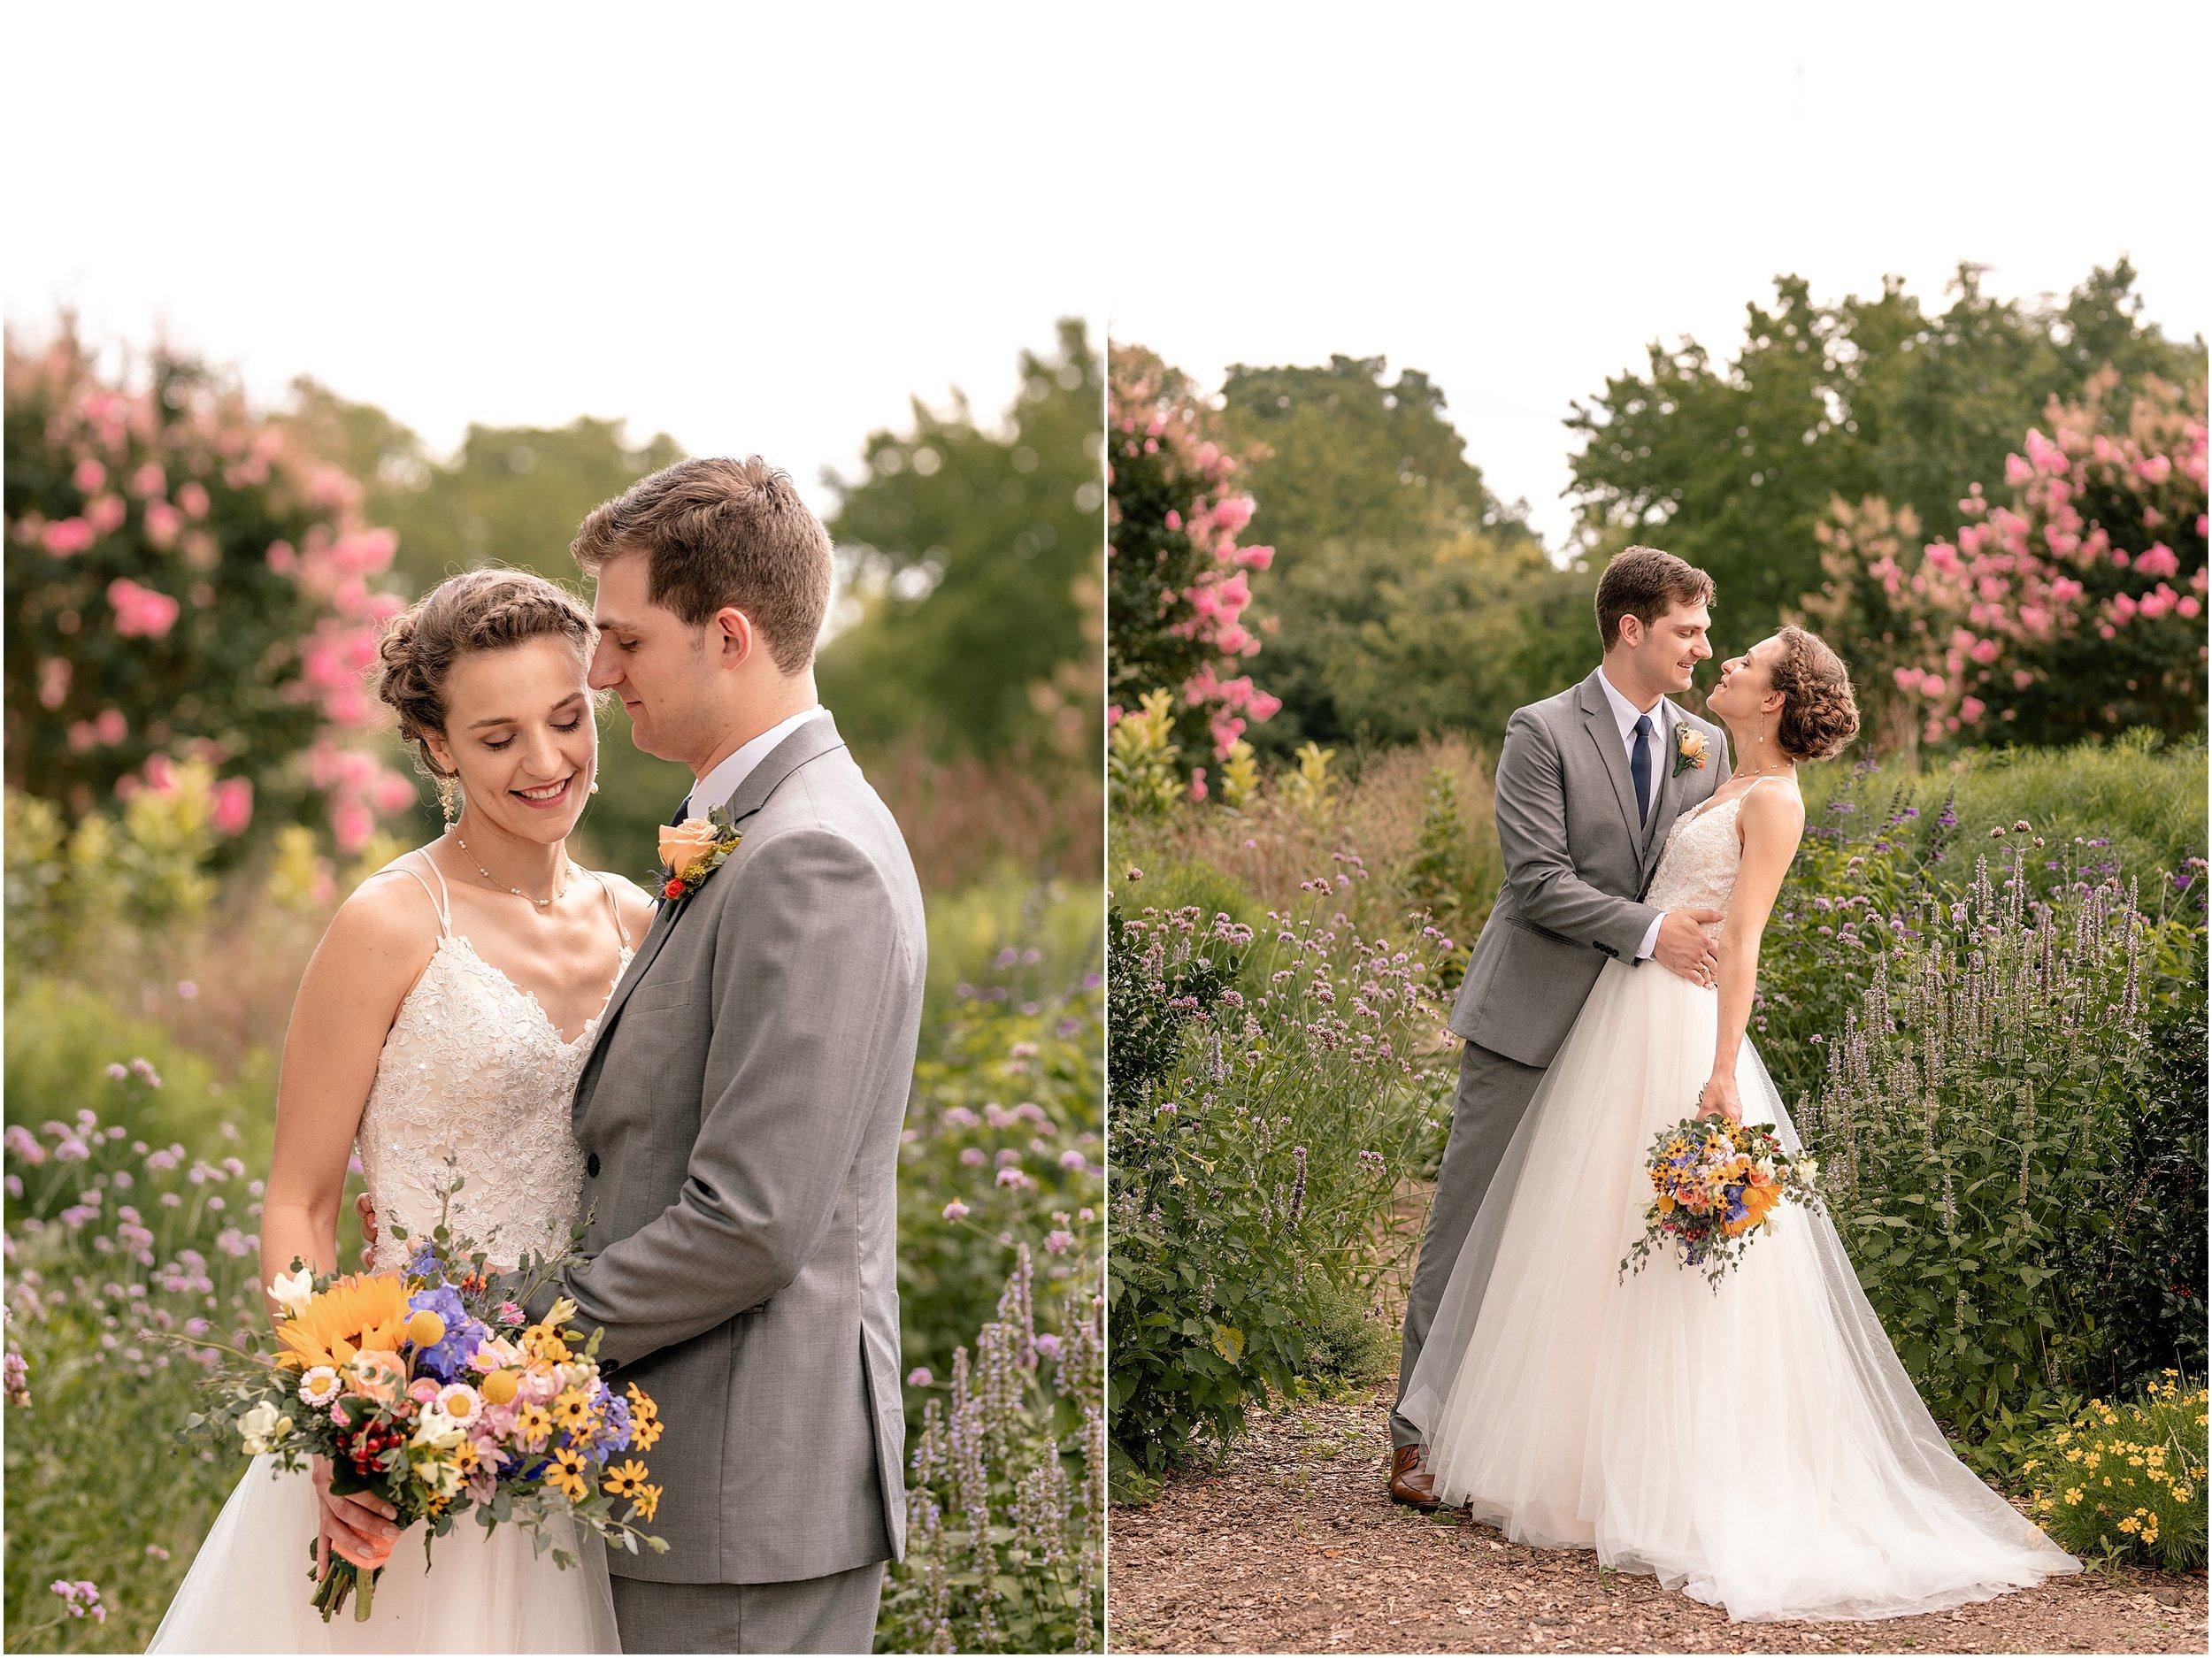 hannah leigh photography Cylburn Arboretum Wedding Baltimore, MD_3408.jpg